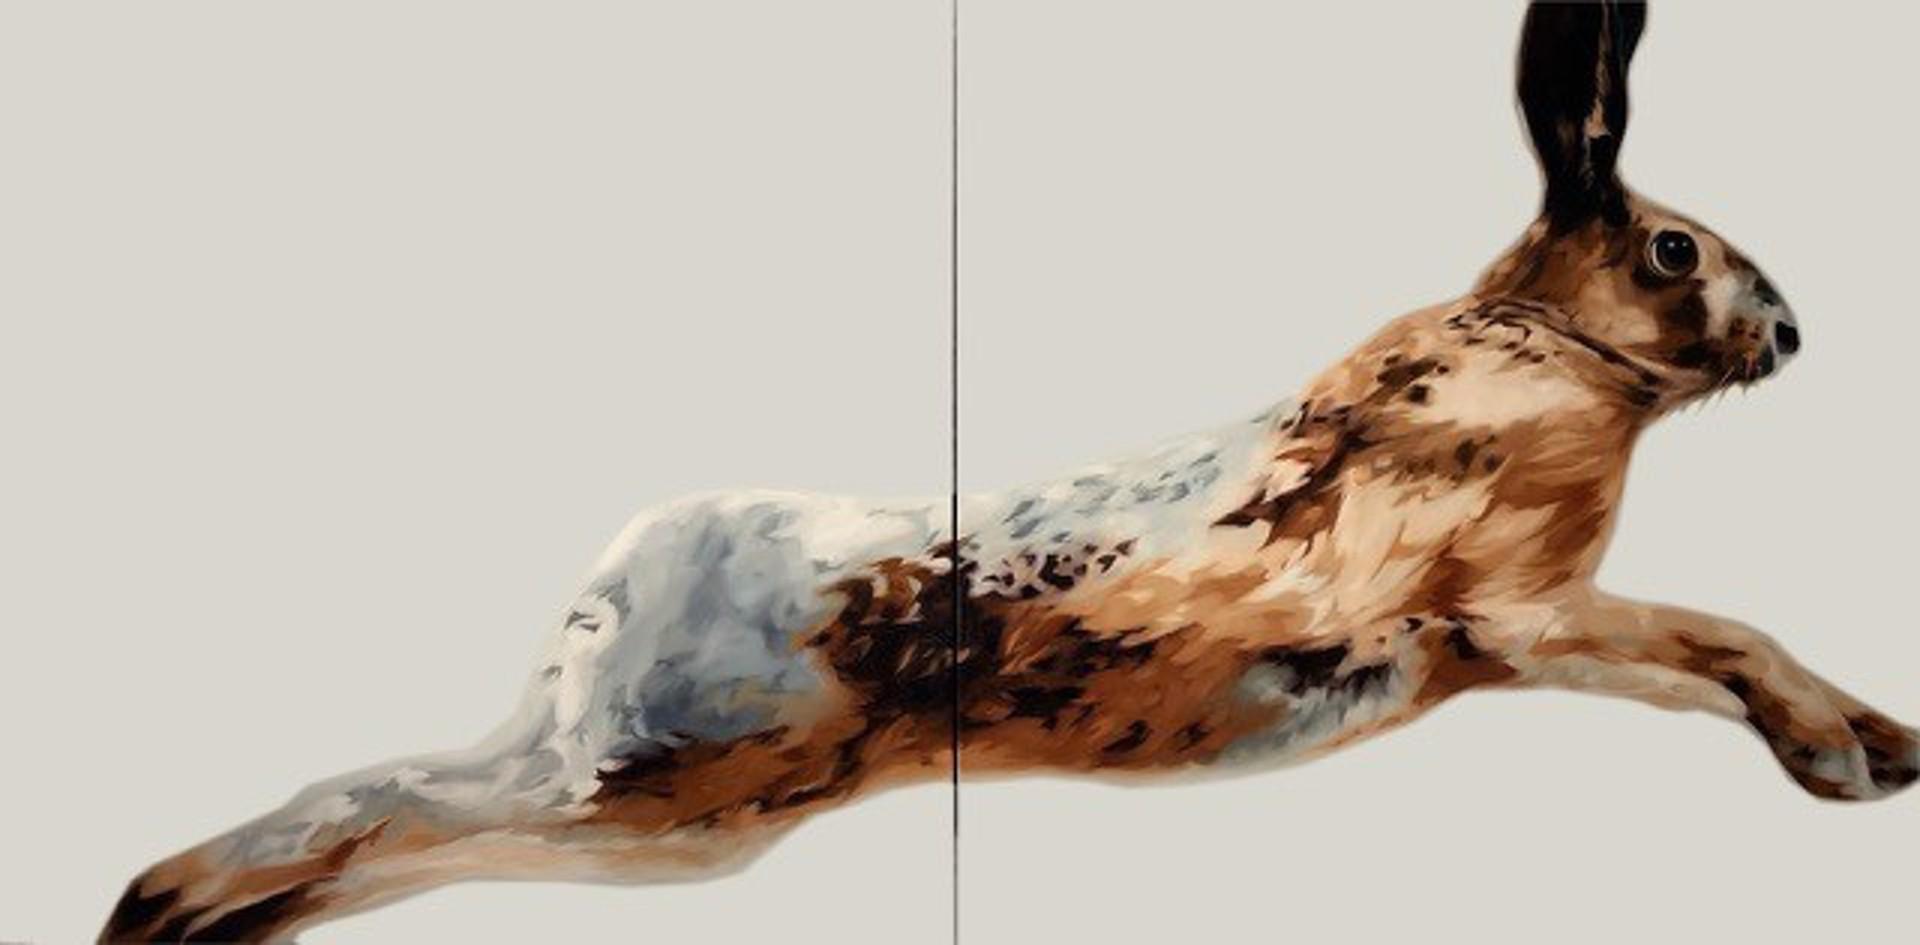 Rabbit Wins The Race (Diptych) by HEATHER MILLAR